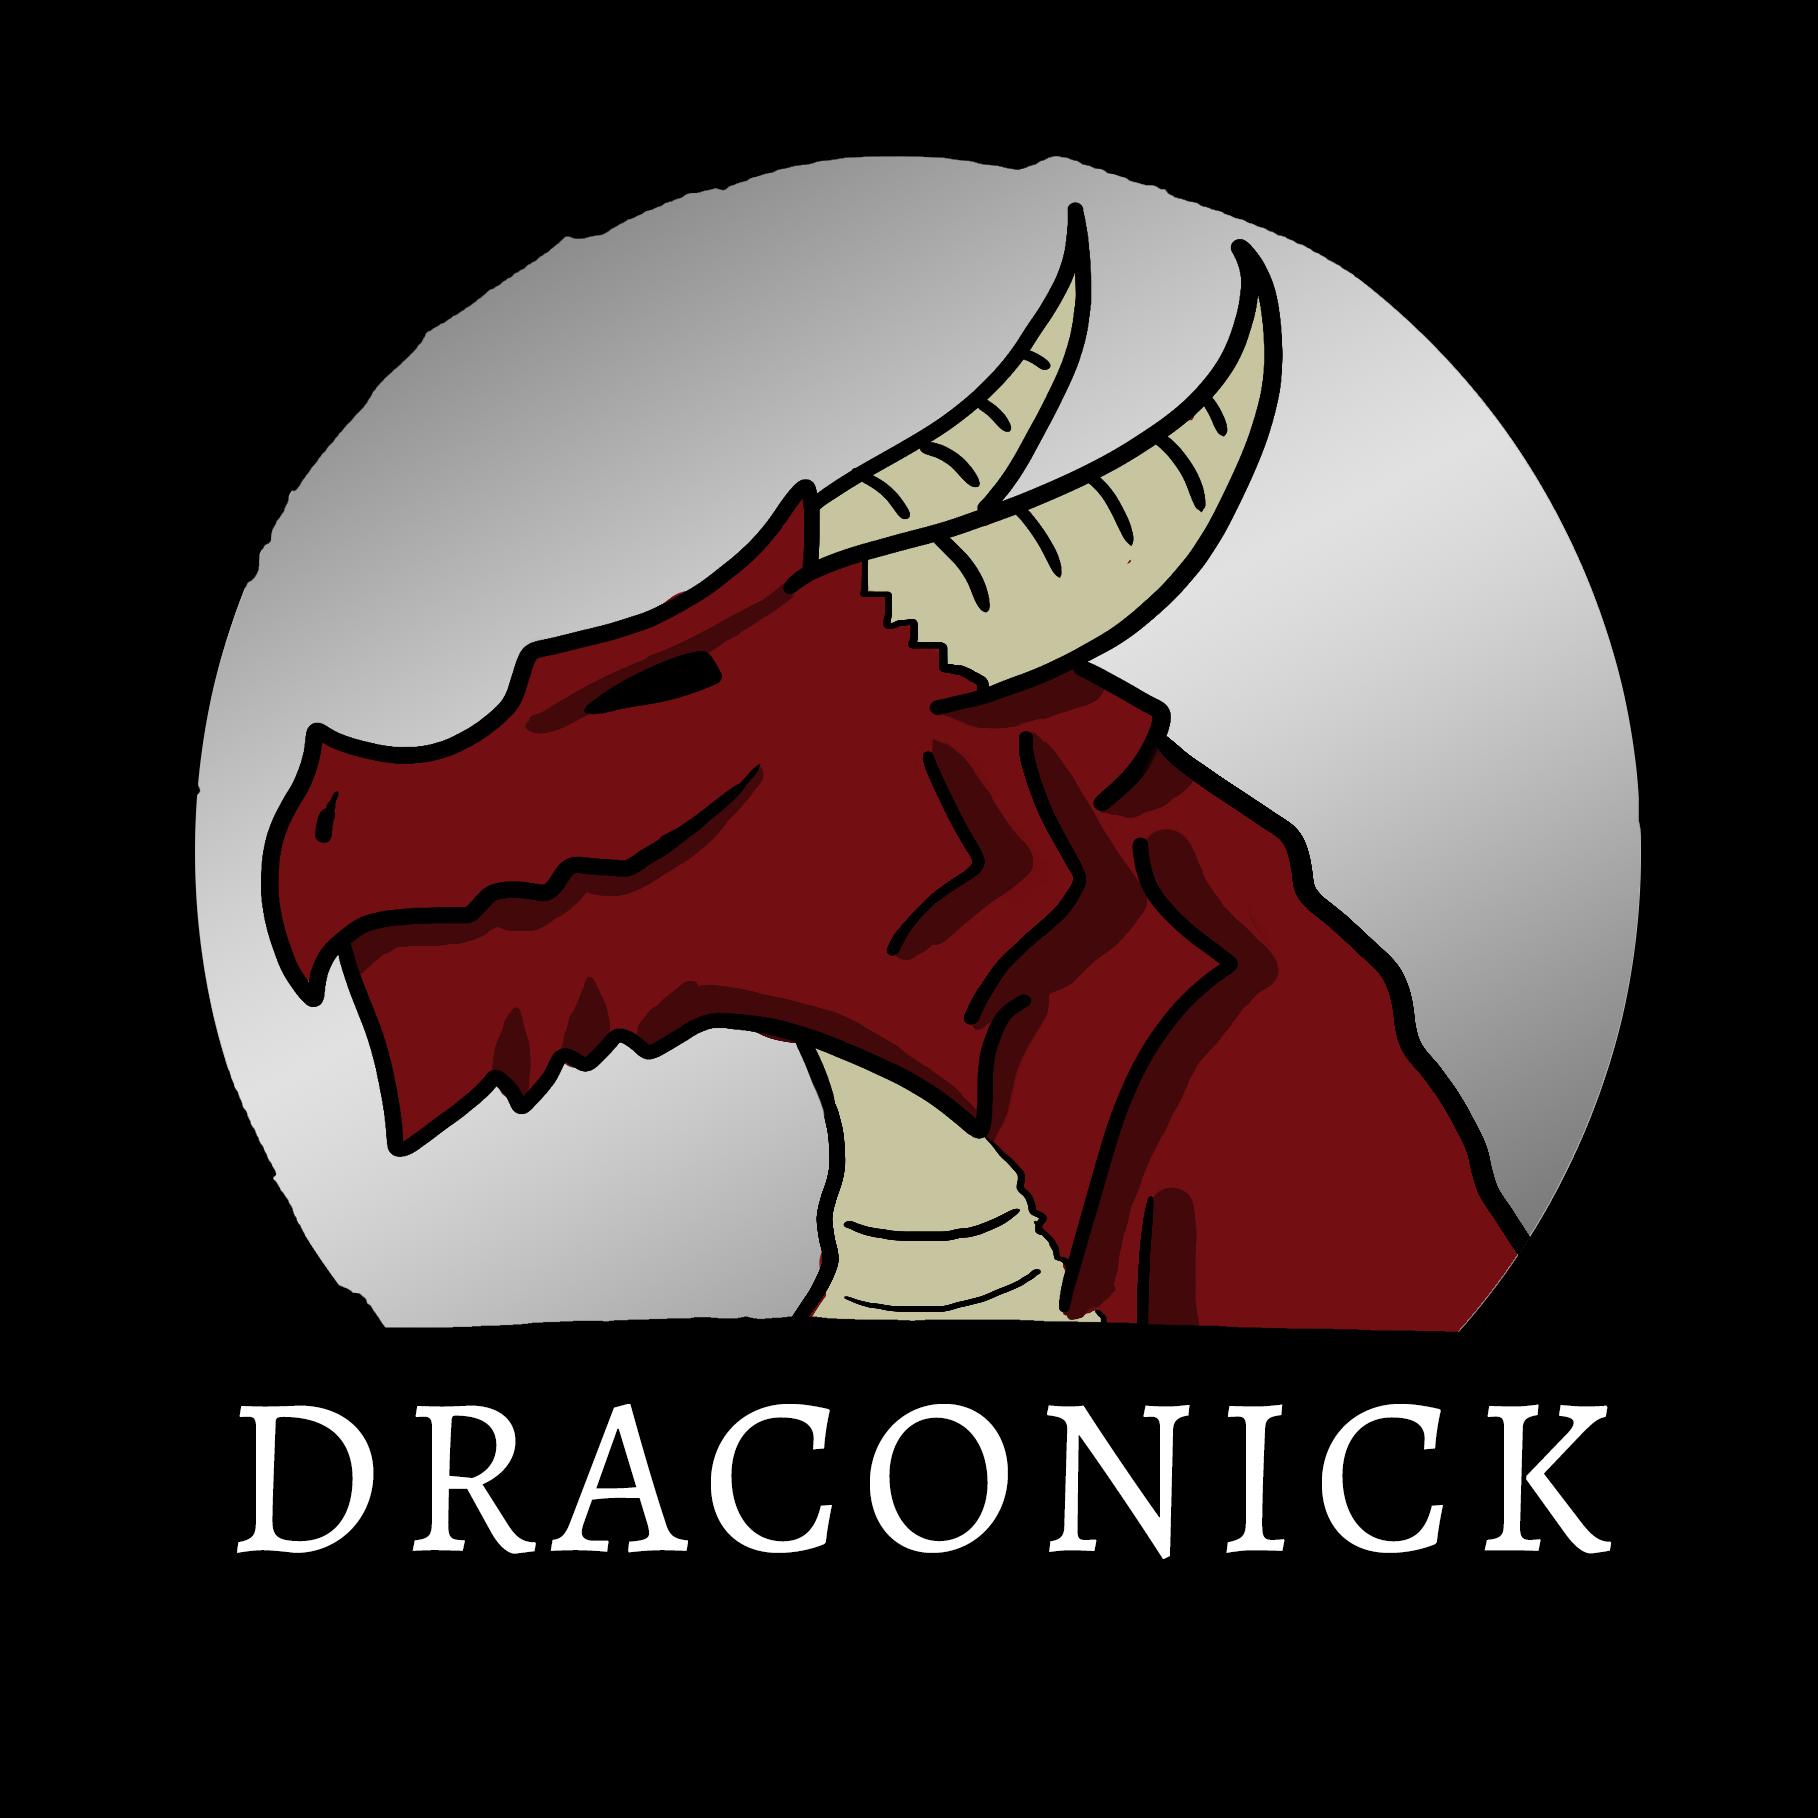 @Draconick Profile Image | Linktree